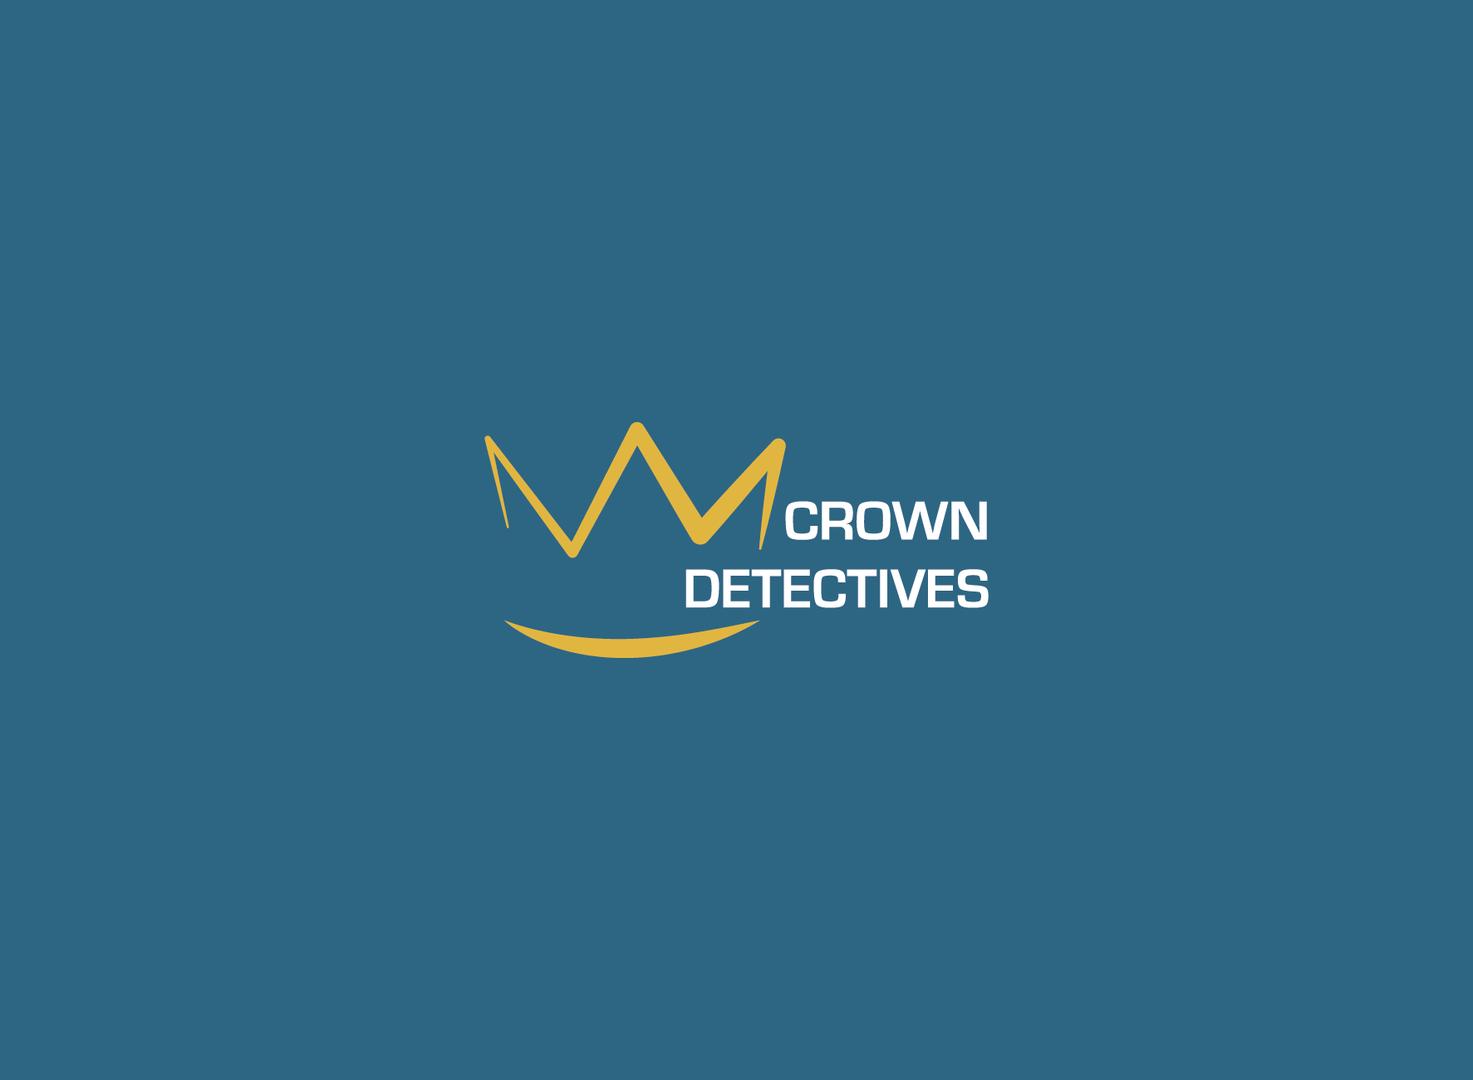 Overzicht crown detectives-02.png